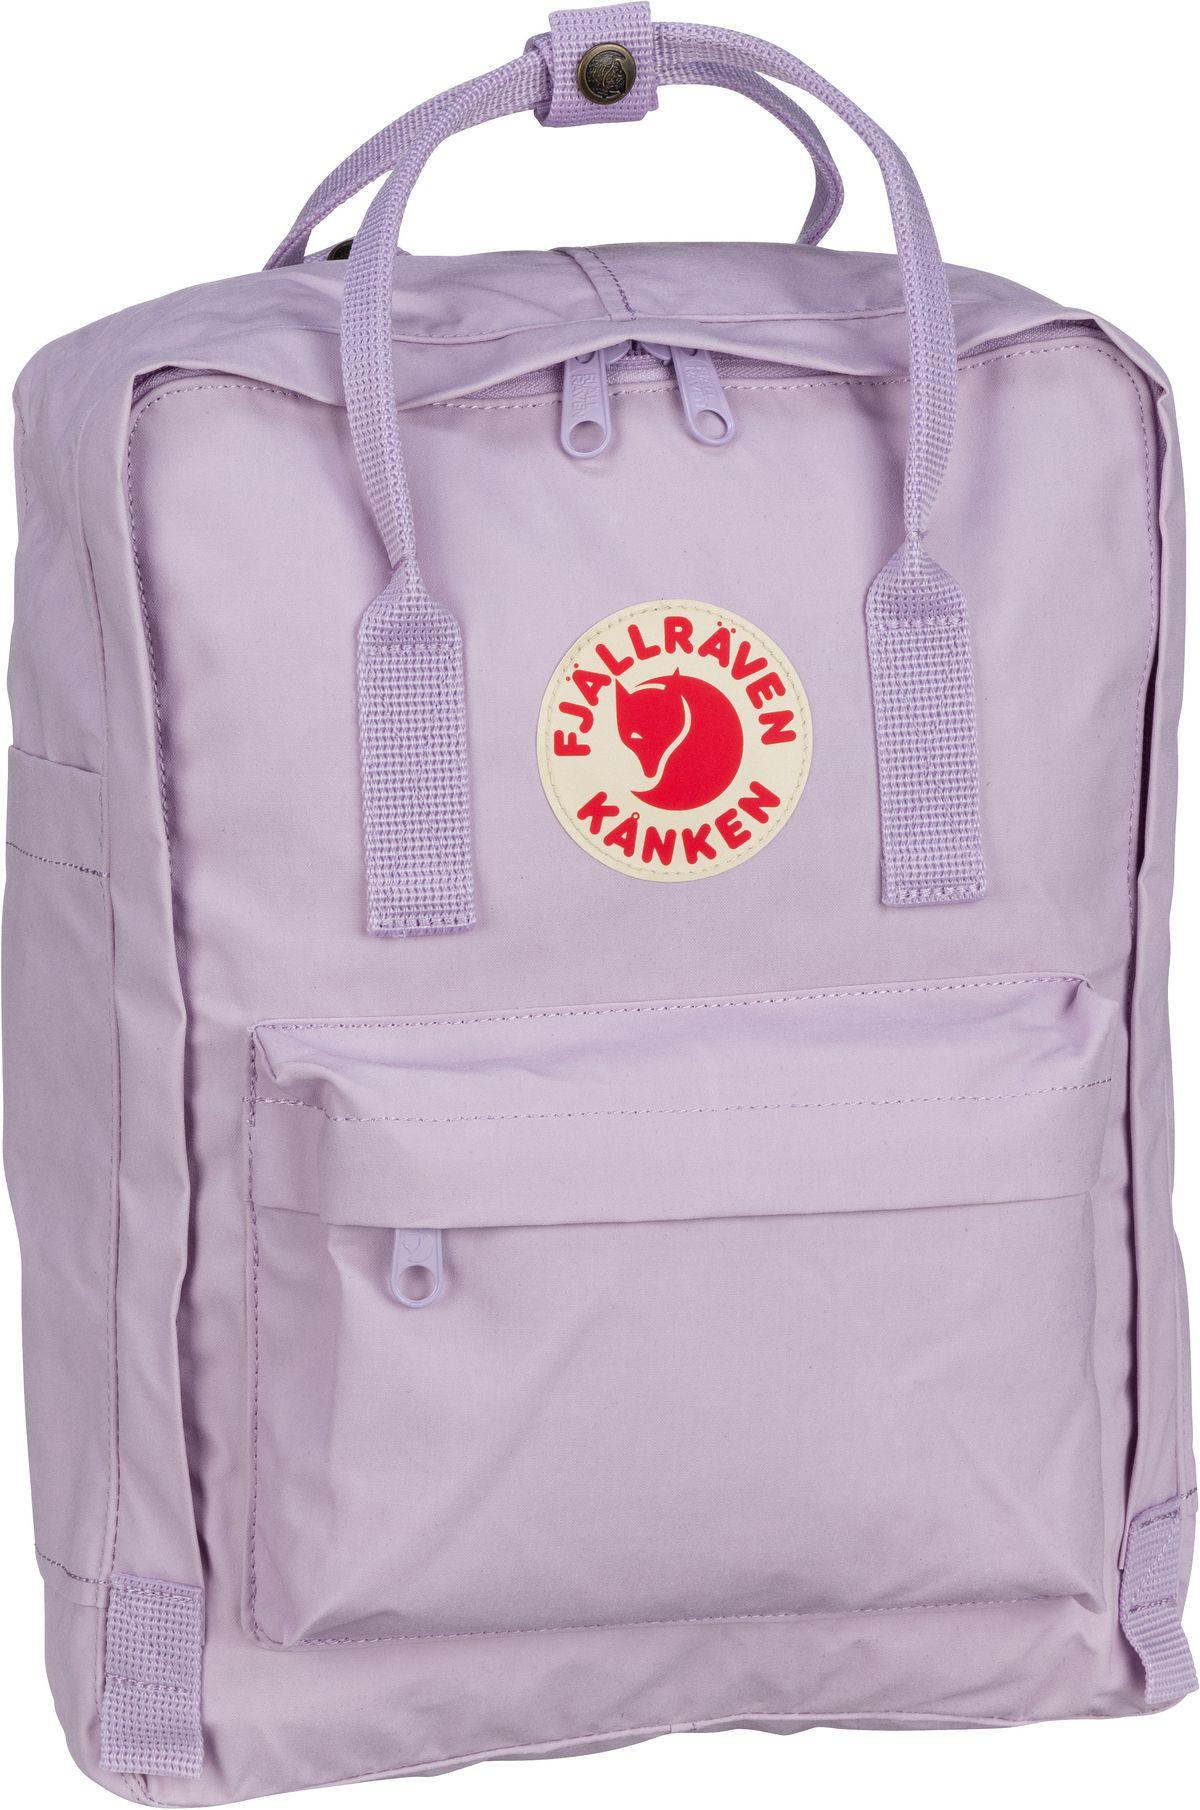 Rucksack / Daypack Kanken Pastel Lavender (16 Liter)